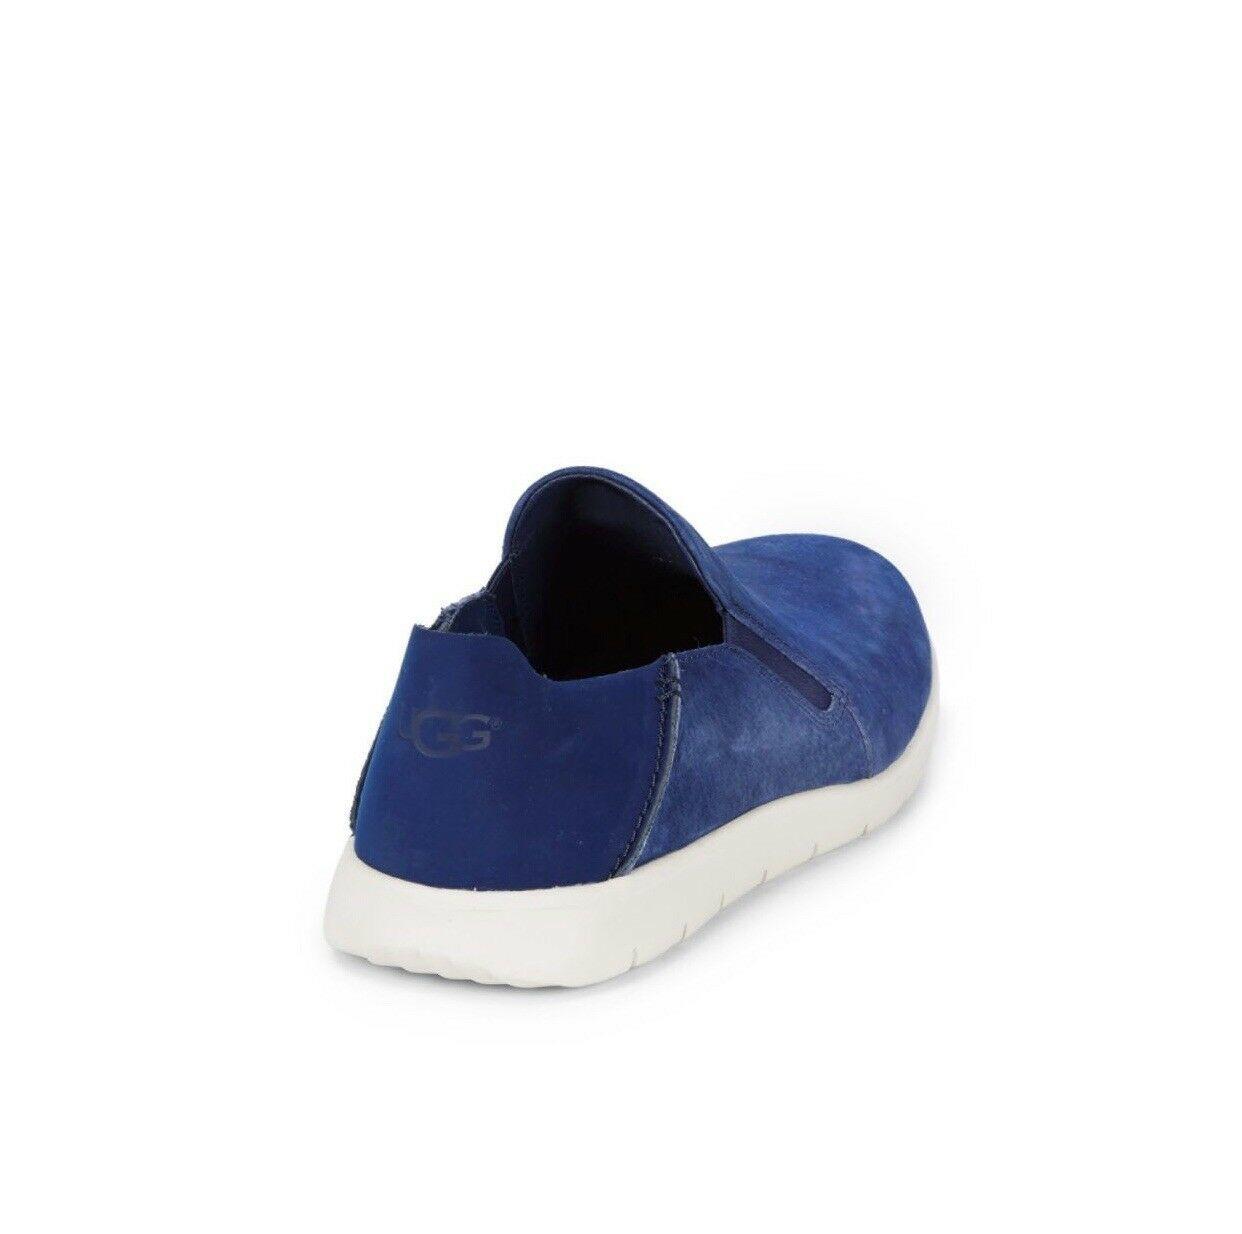 NEW UGG Men's Knox Suede Slip On Sneaker, Sizes 9, 11  Blue, MSRP $100 image 5